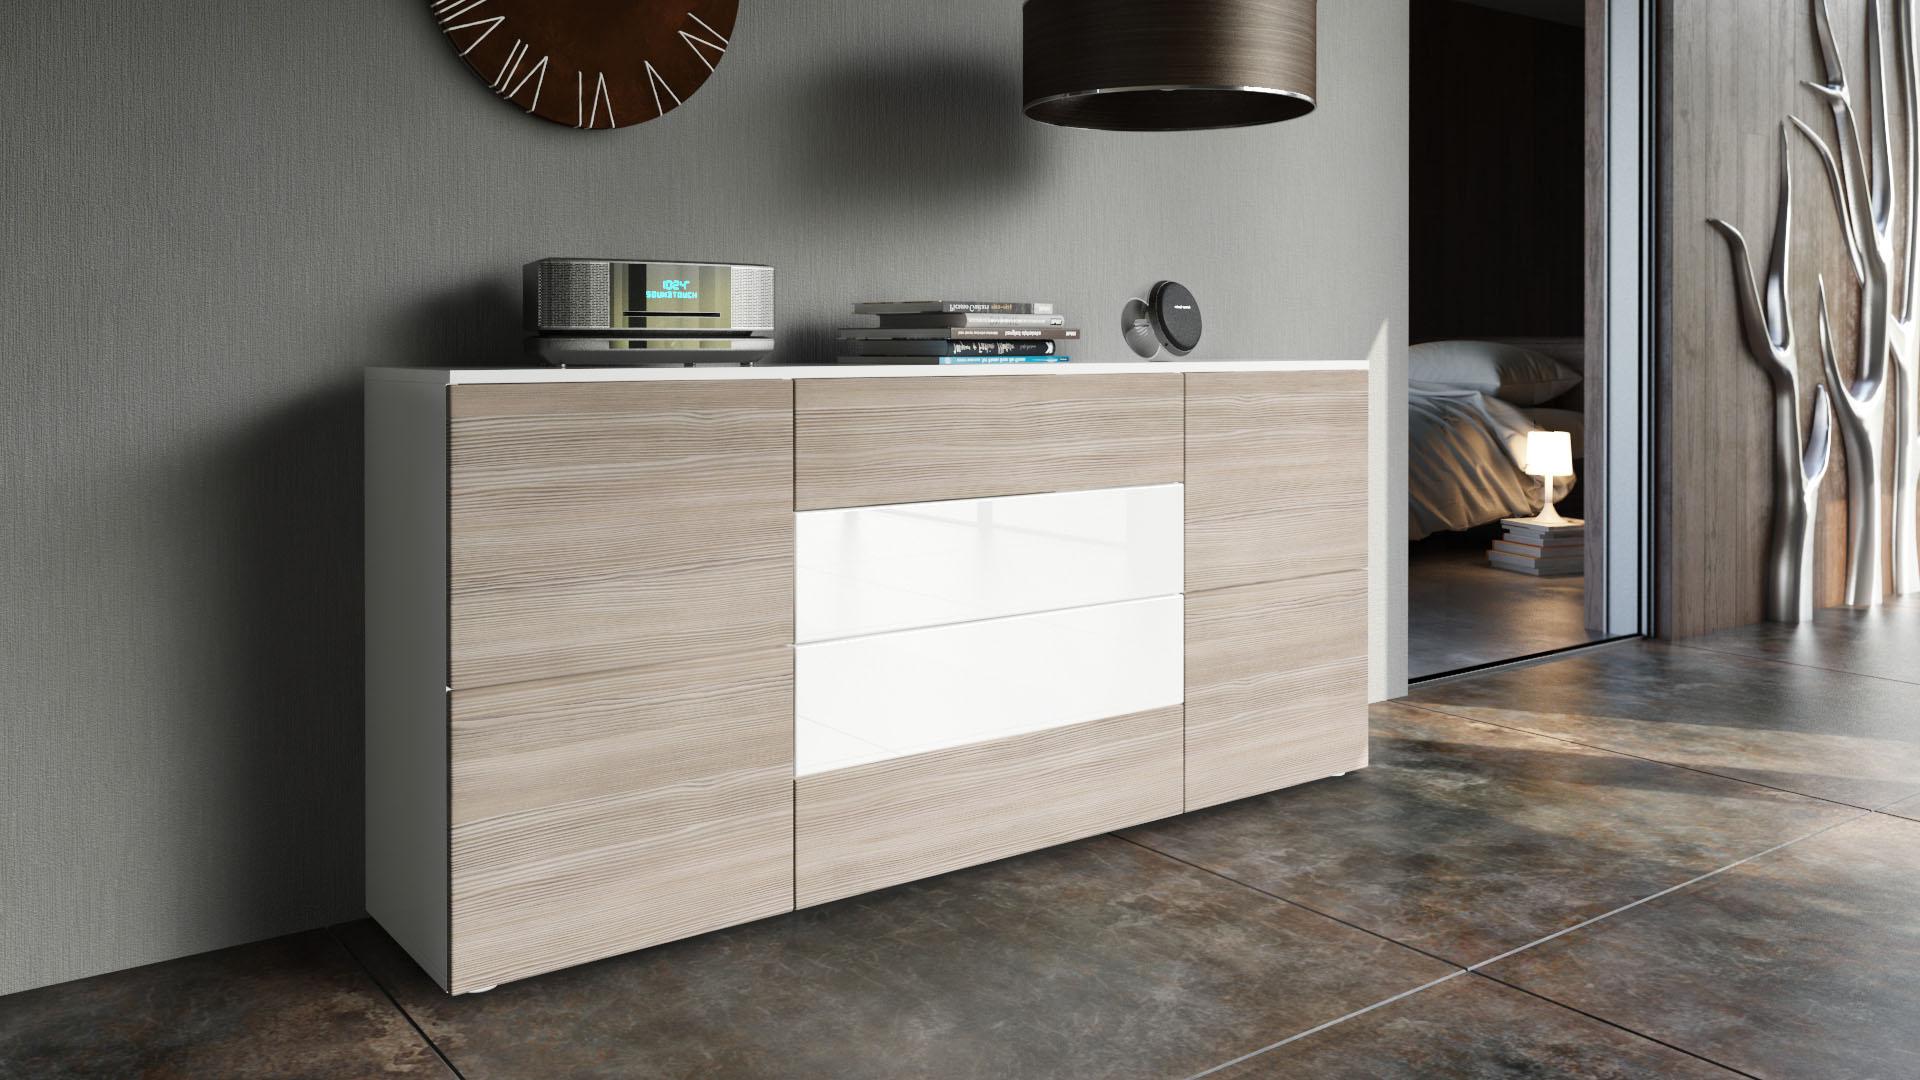 sideboard cabinet rova in white high gloss natural tones ebay. Black Bedroom Furniture Sets. Home Design Ideas